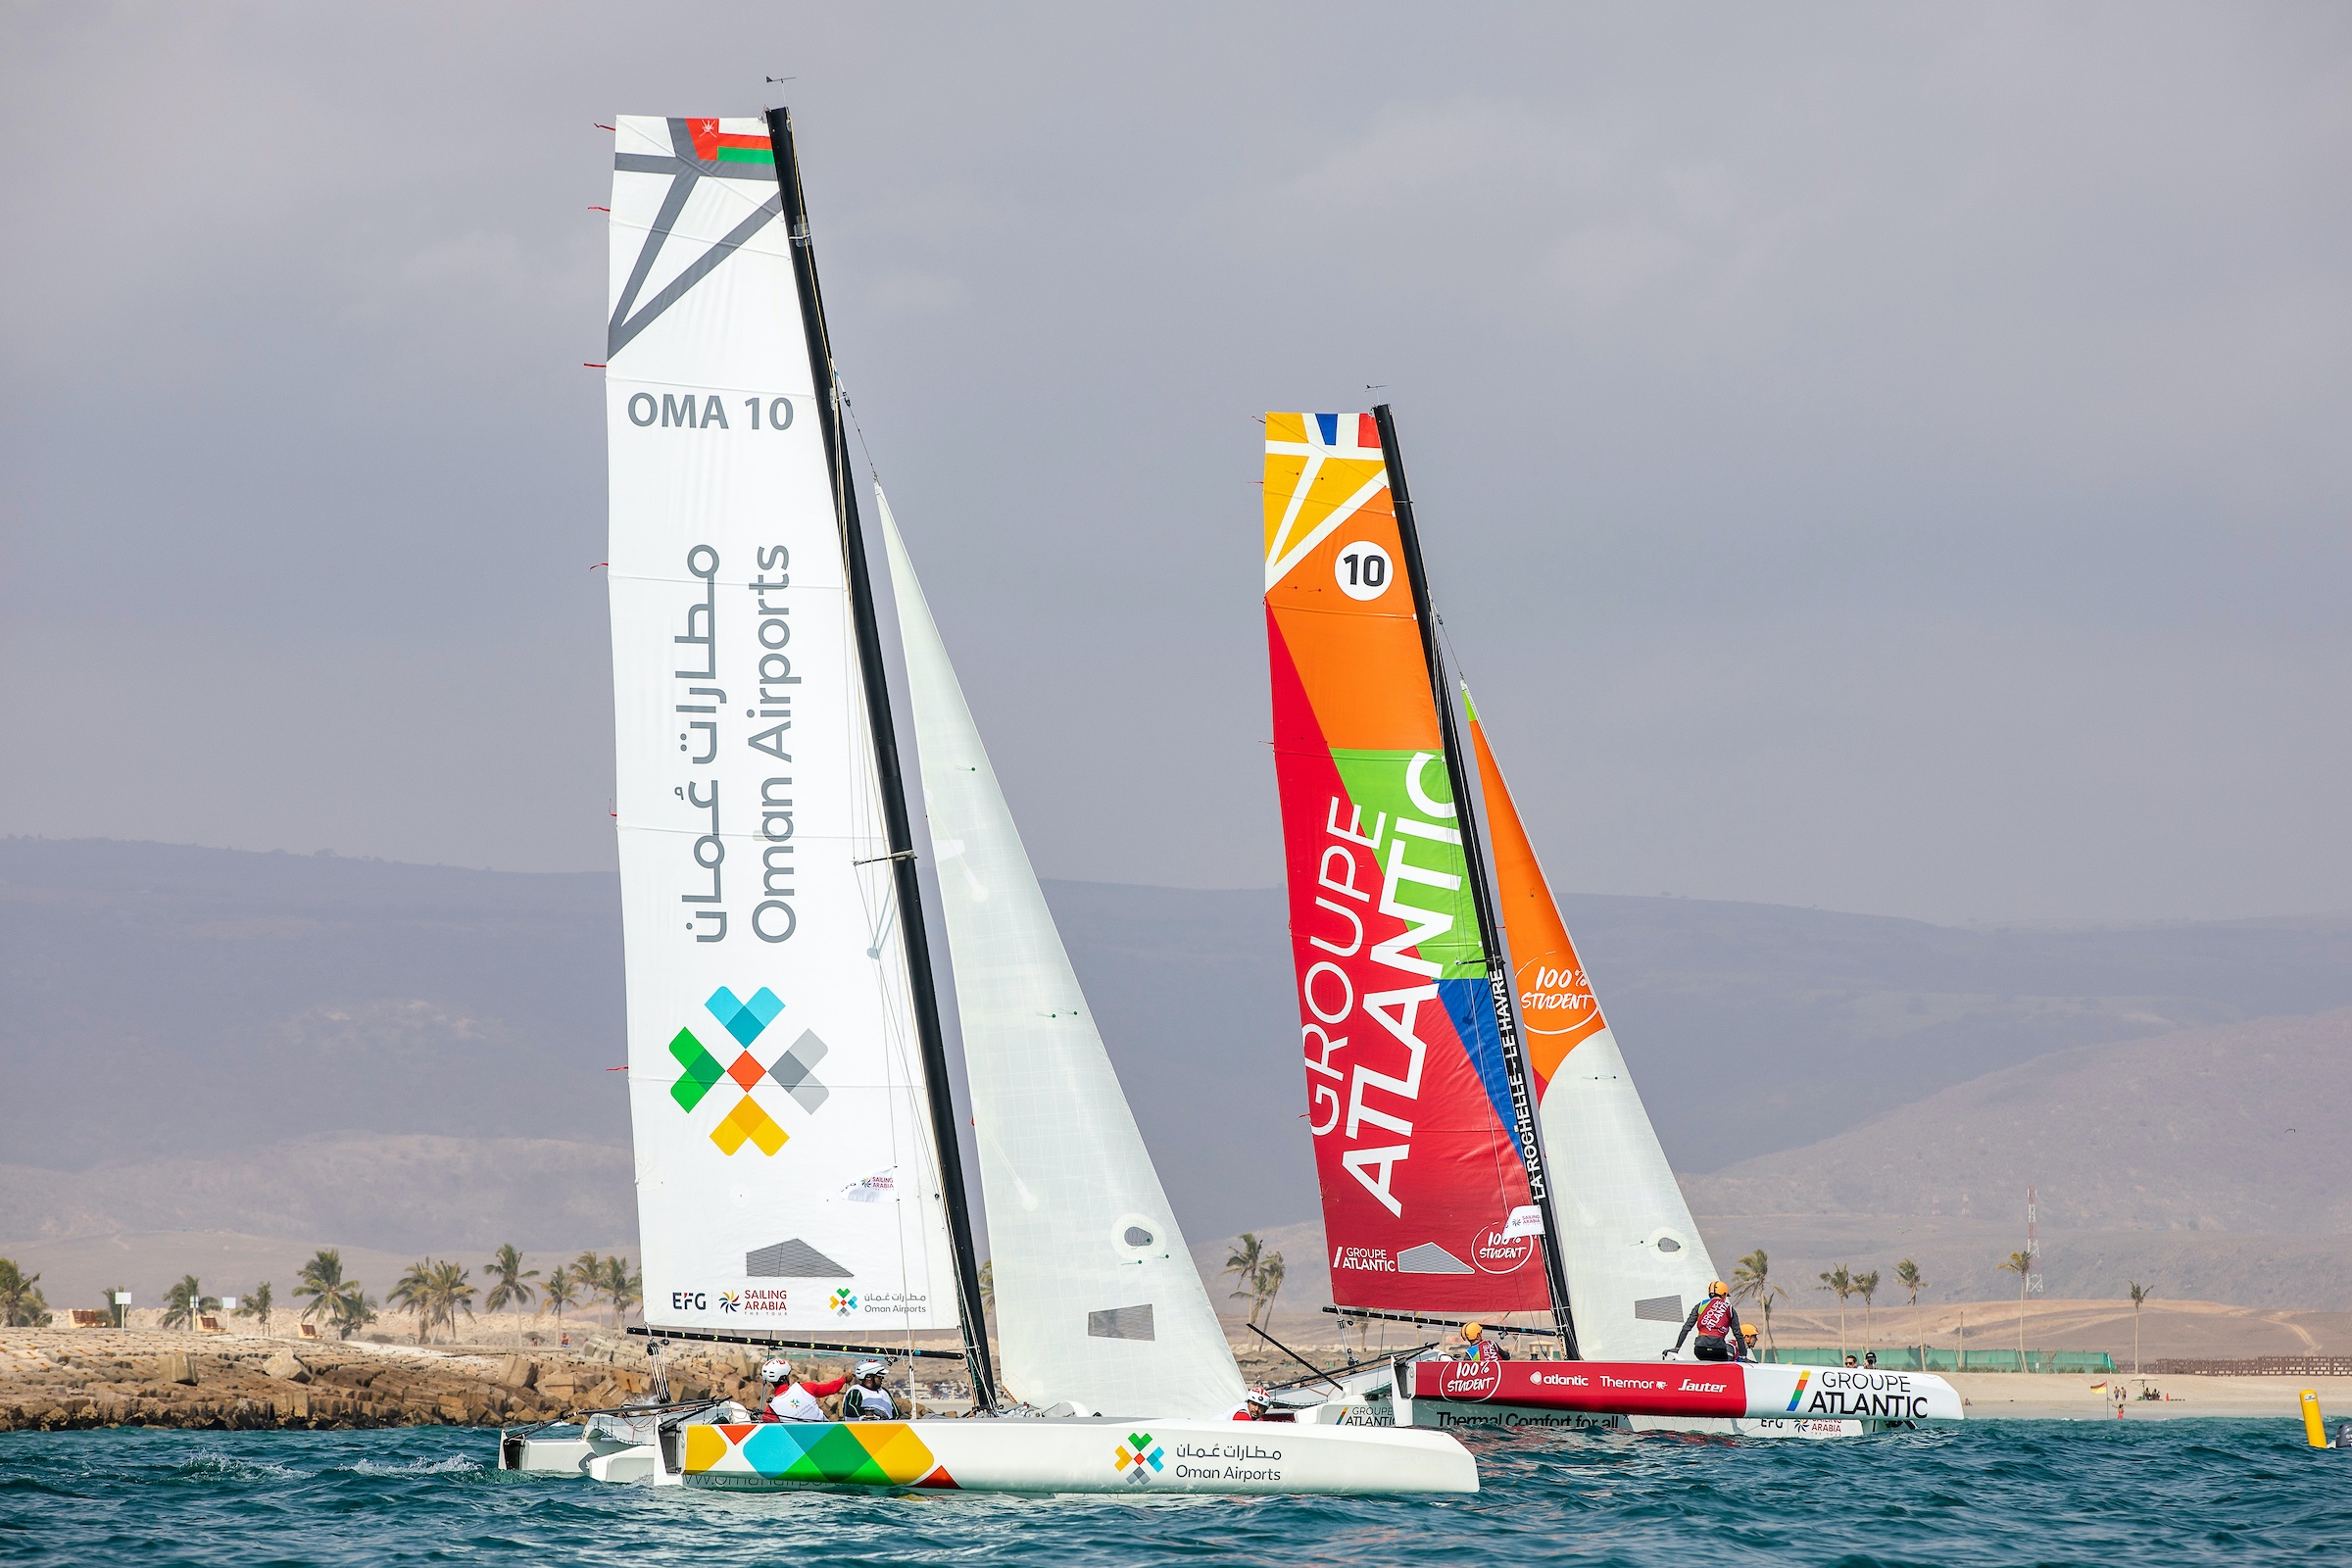 Tenth edition of EFG Sailing Arabia – The Tour opens in Salalah (4).jpg